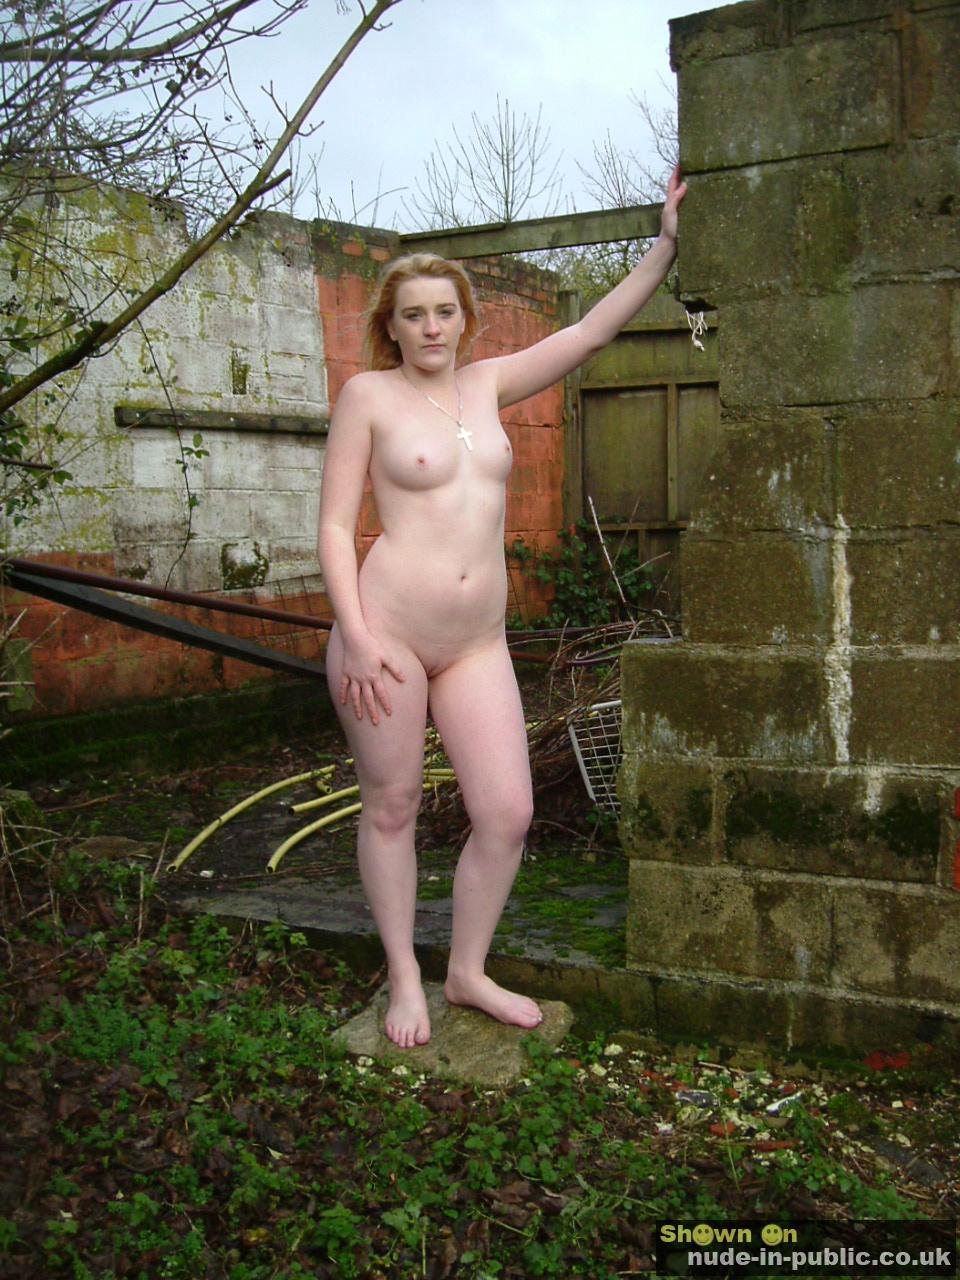 Nude Women Ehibitionists In Public